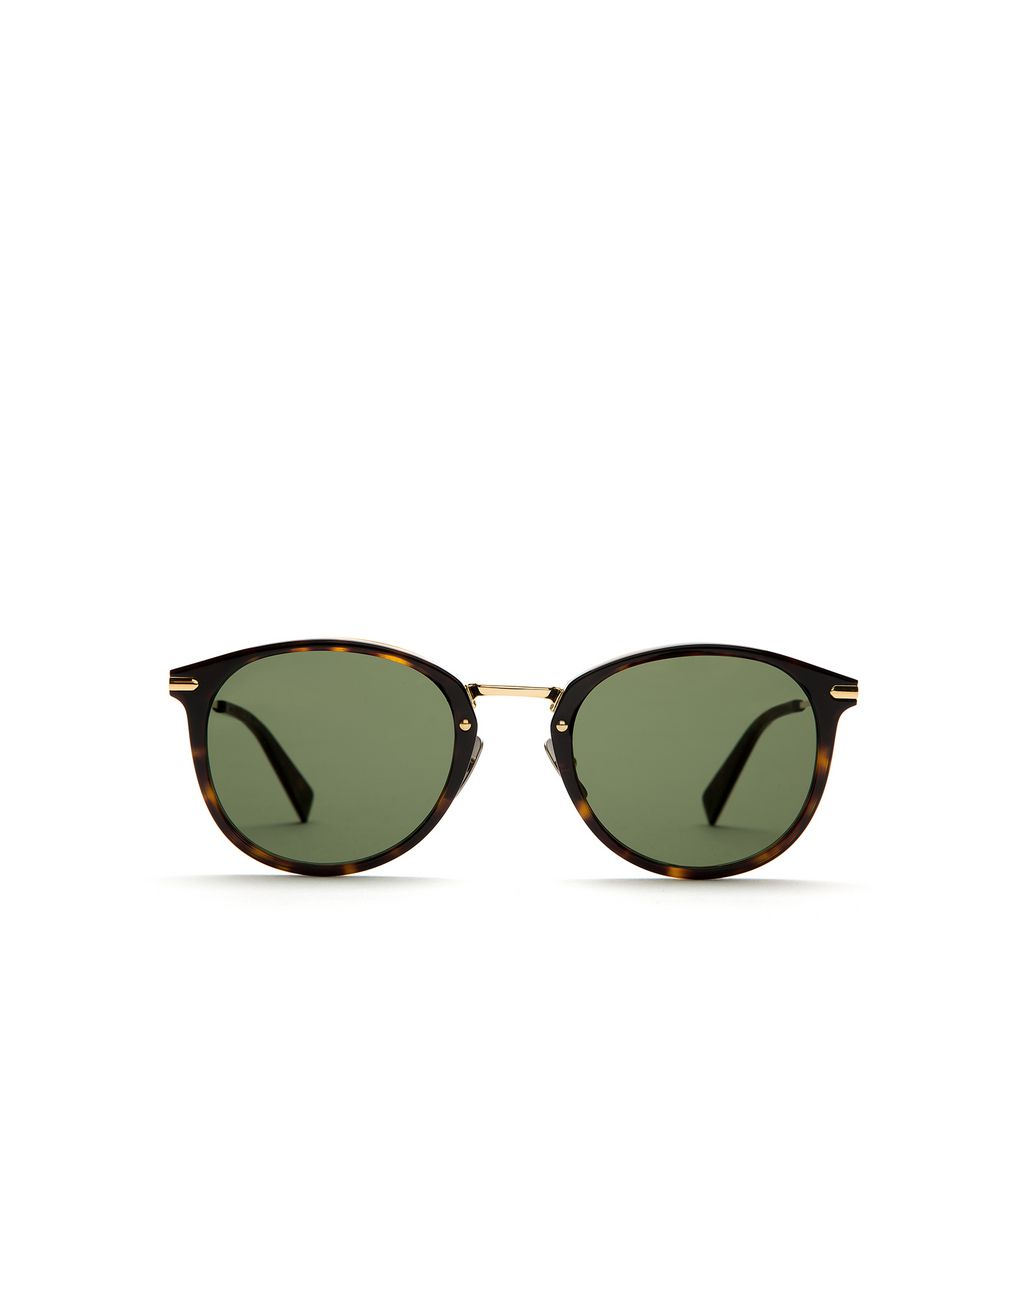 "BRIONI Солнцезащитные очки в блестящей оправе цвета ""гавана"" с зелеными линзами Солнцезащитные очки Для Мужчин f"